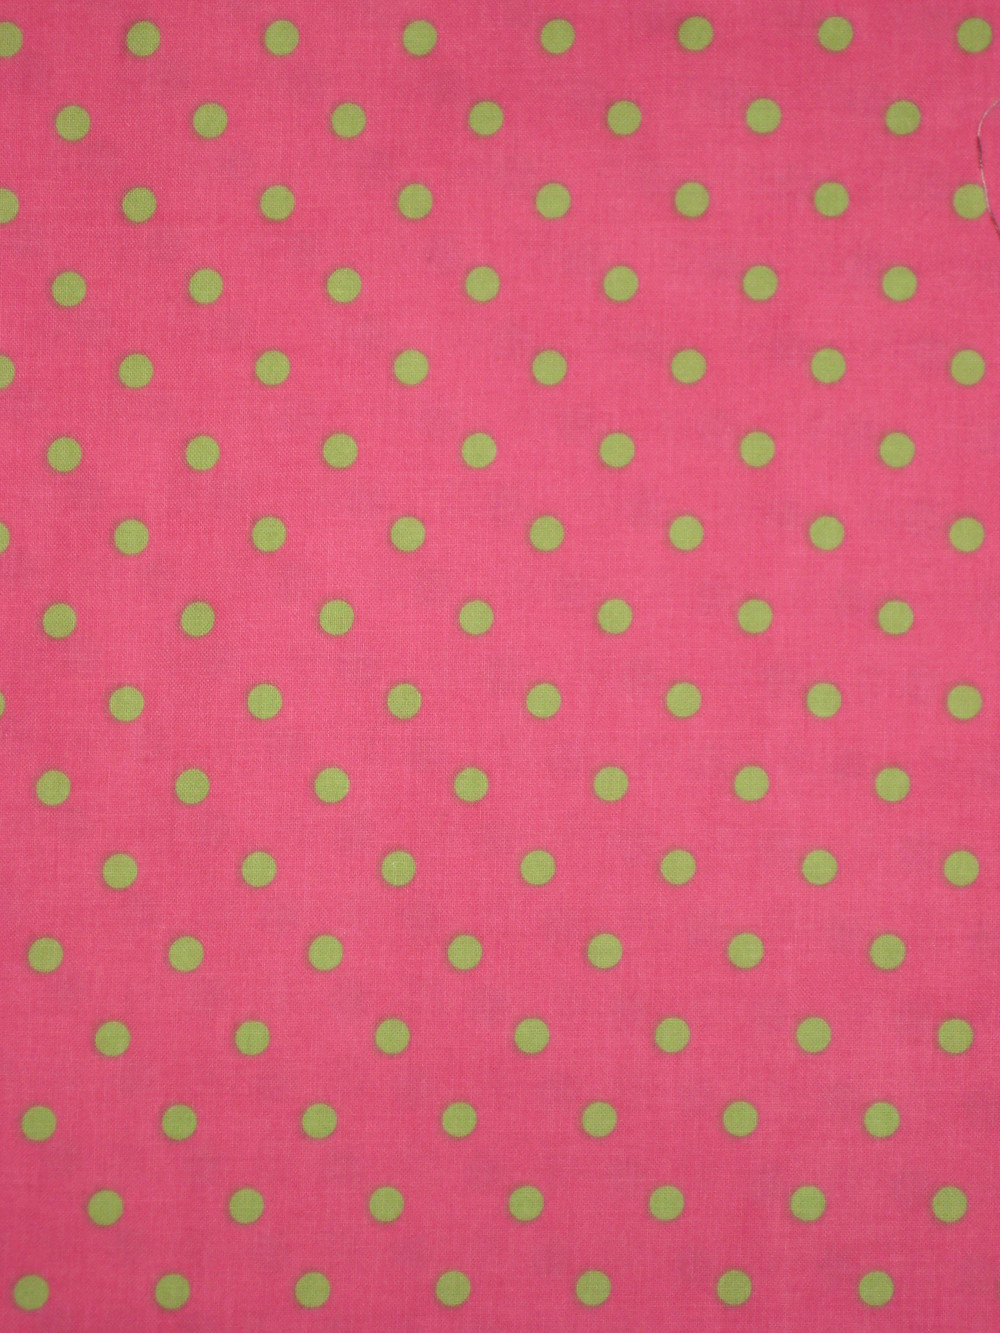 Pink with Green Polka Dots.jpg